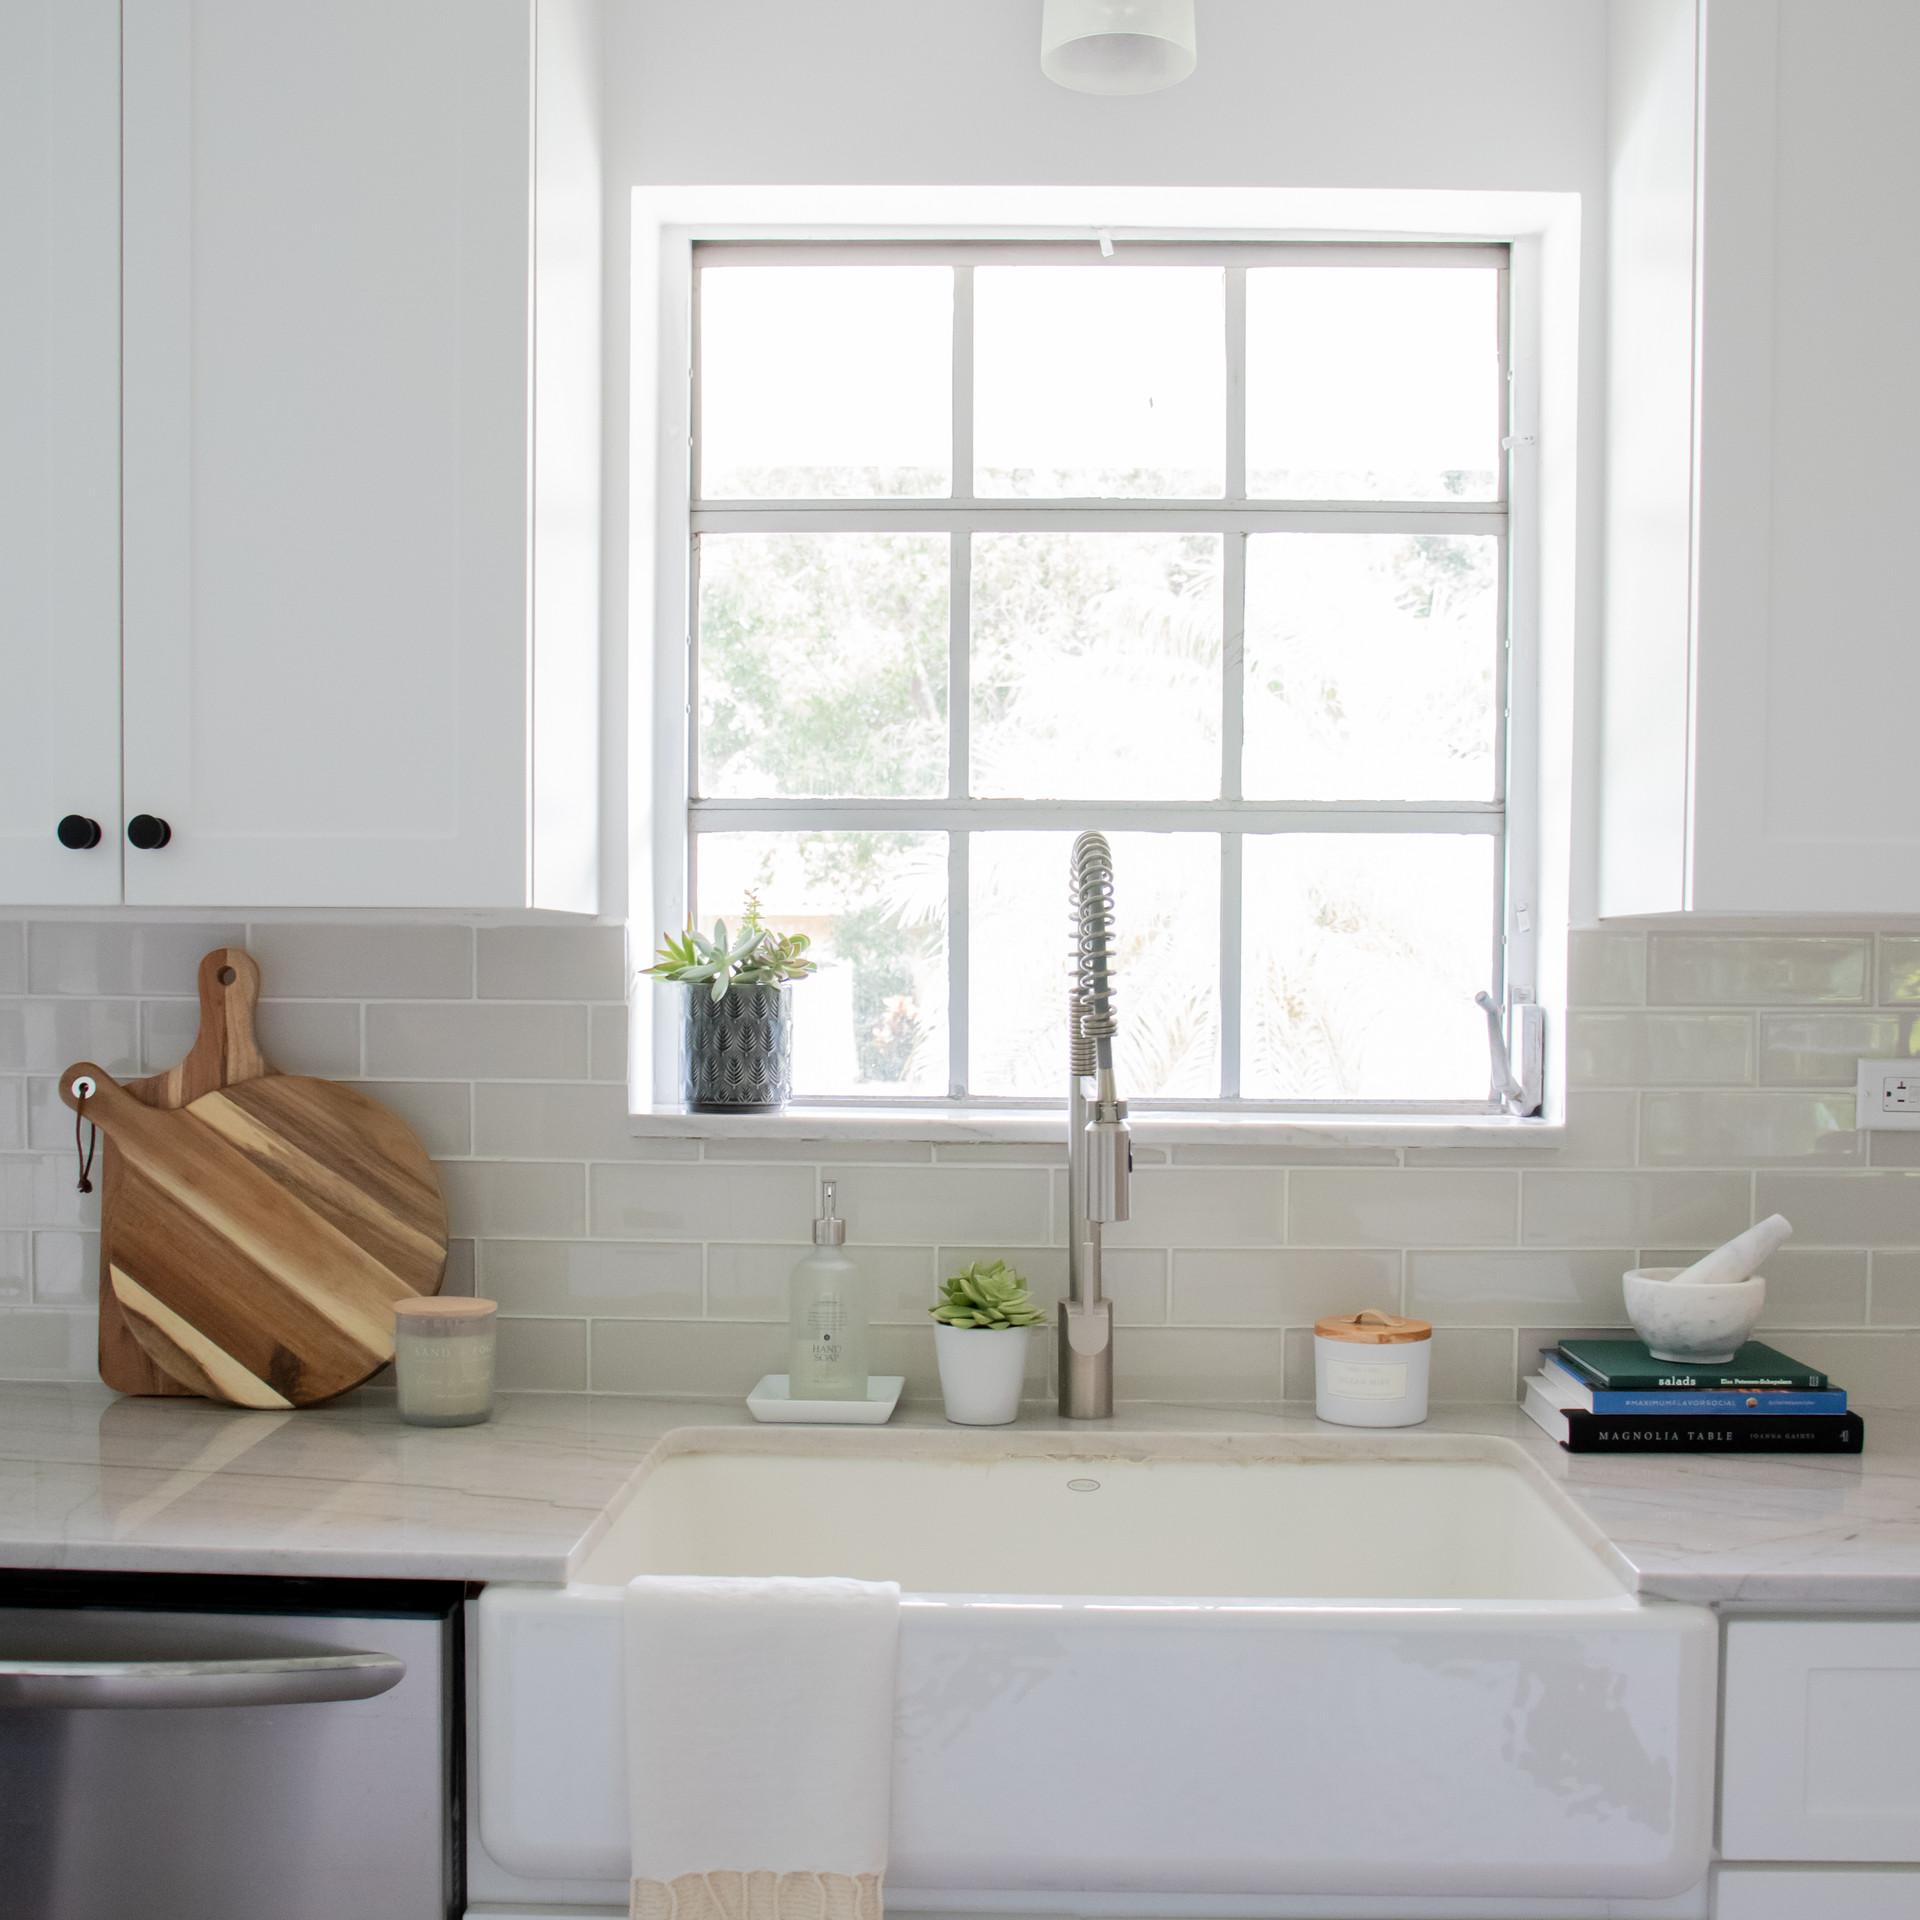 Modern bright white galley style kitchen with farm house sink designed by Miami based interior design studio KJ Design Collective